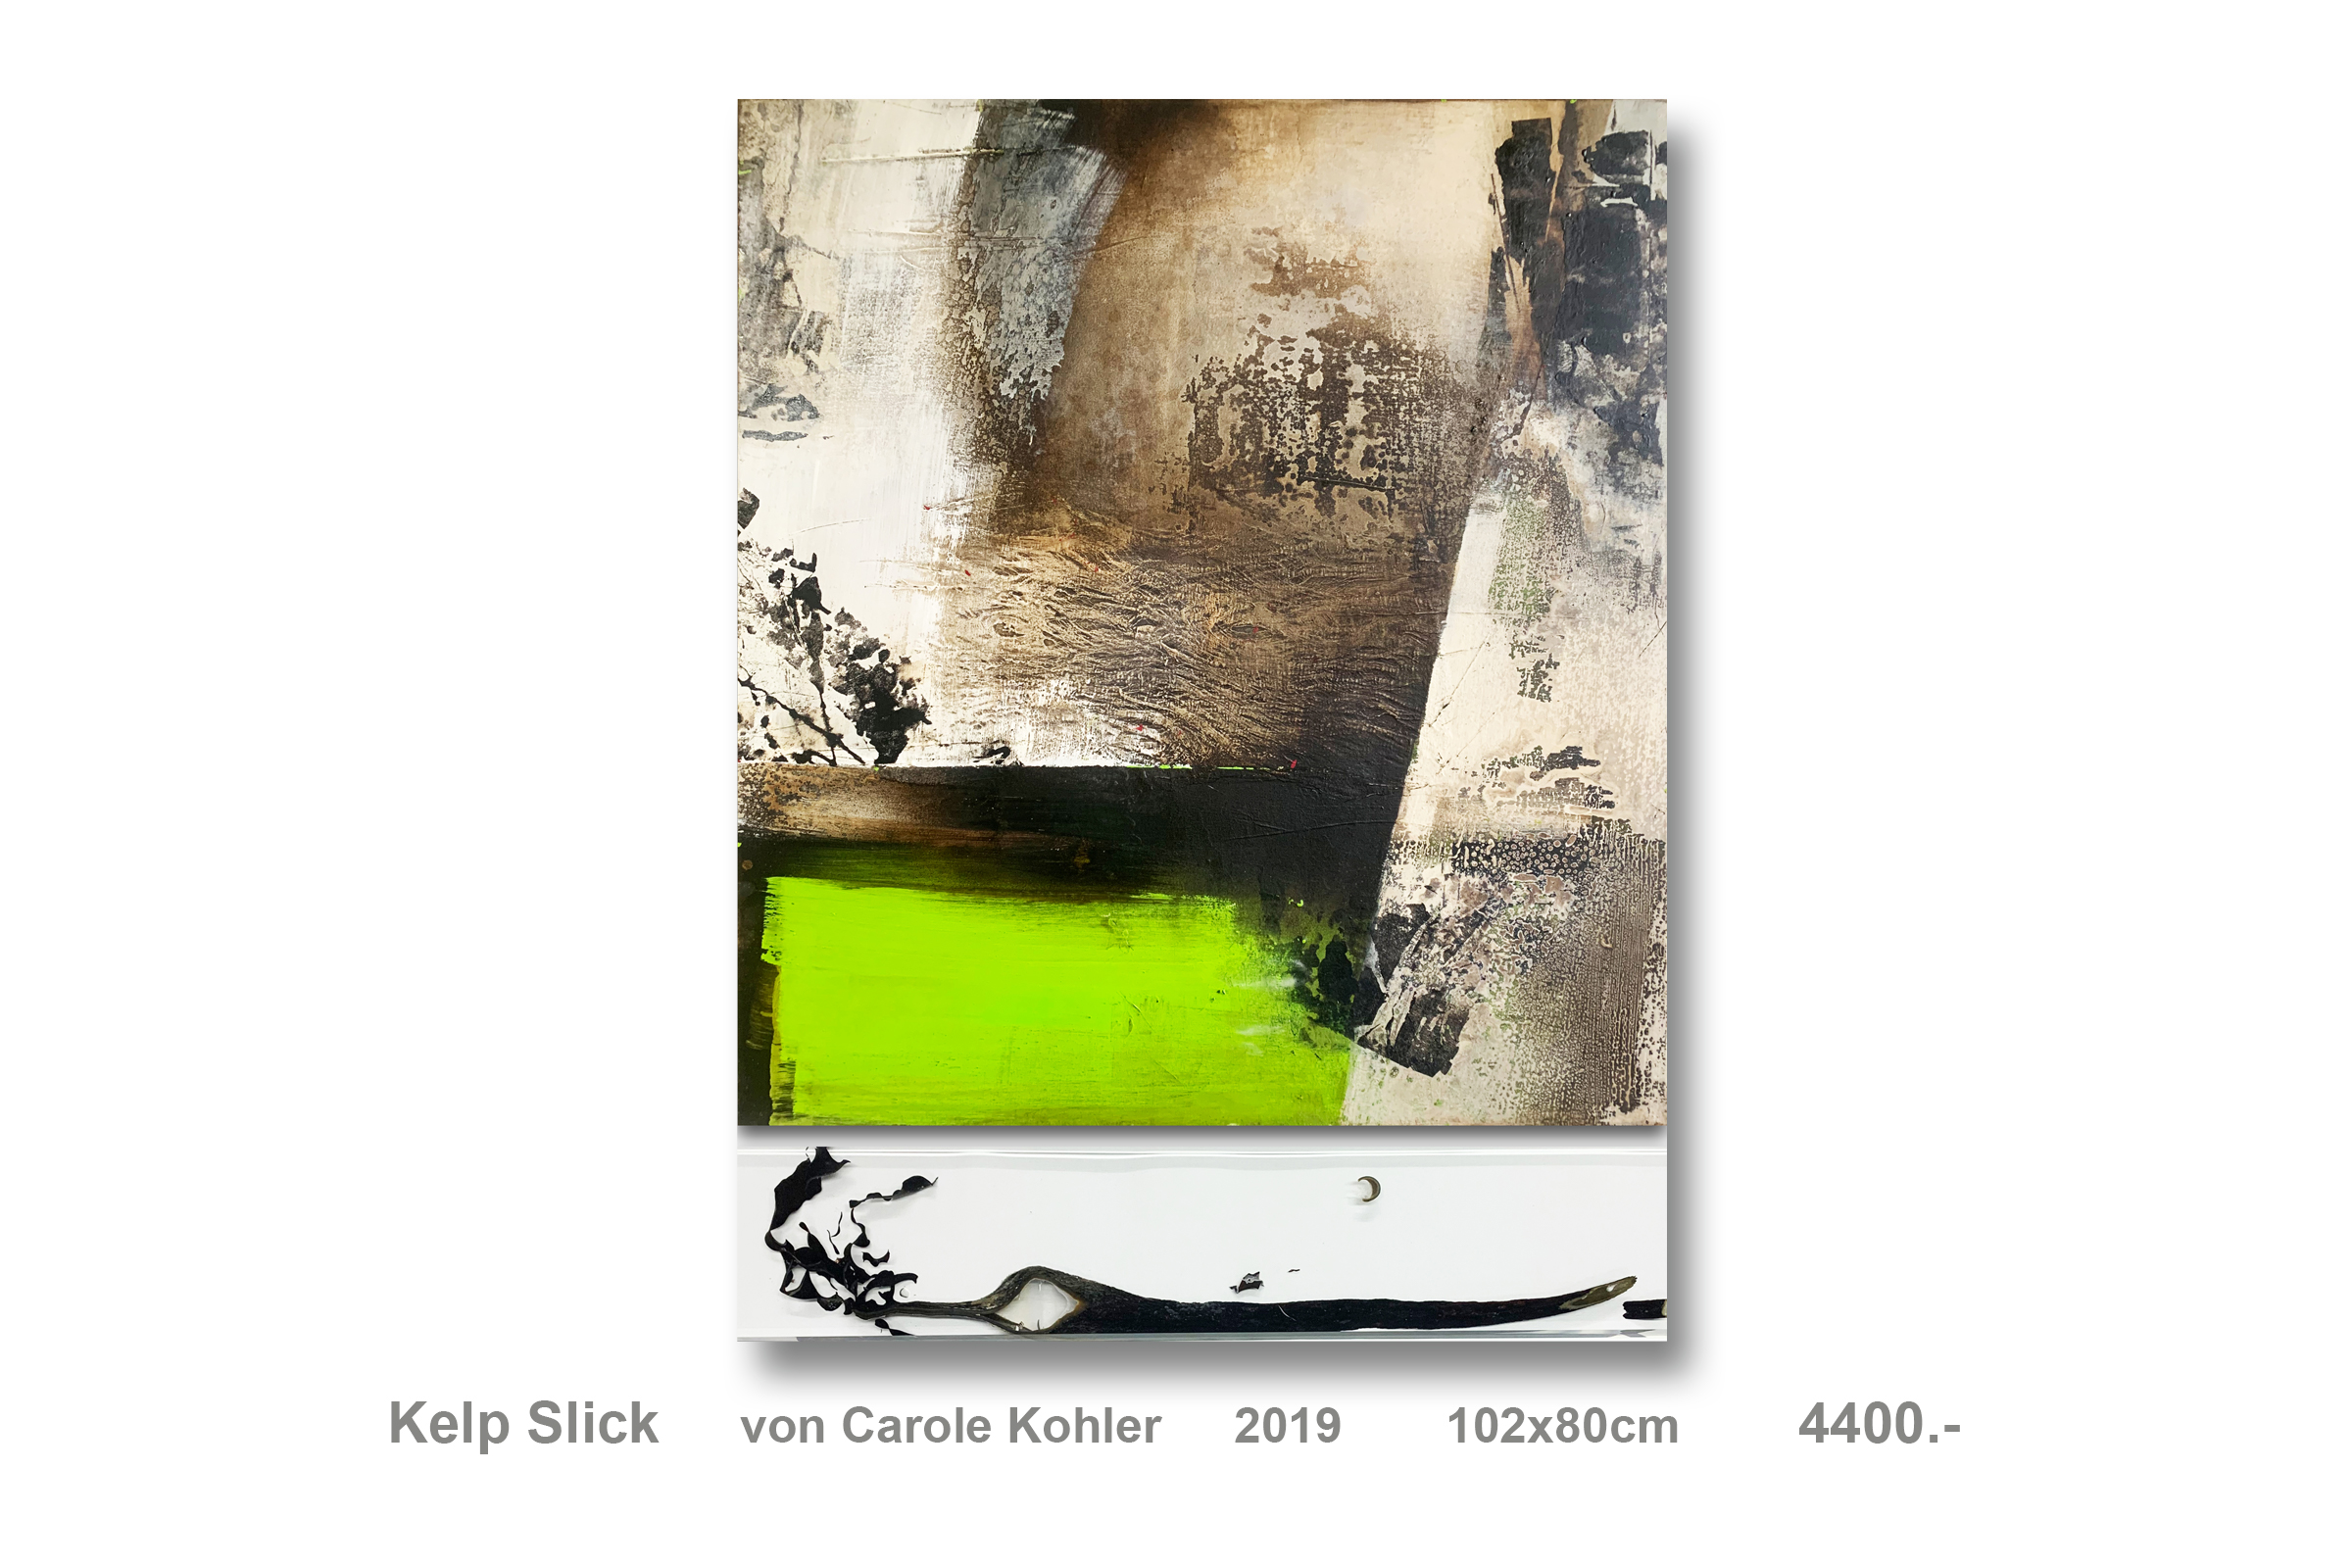 Kelp Slick